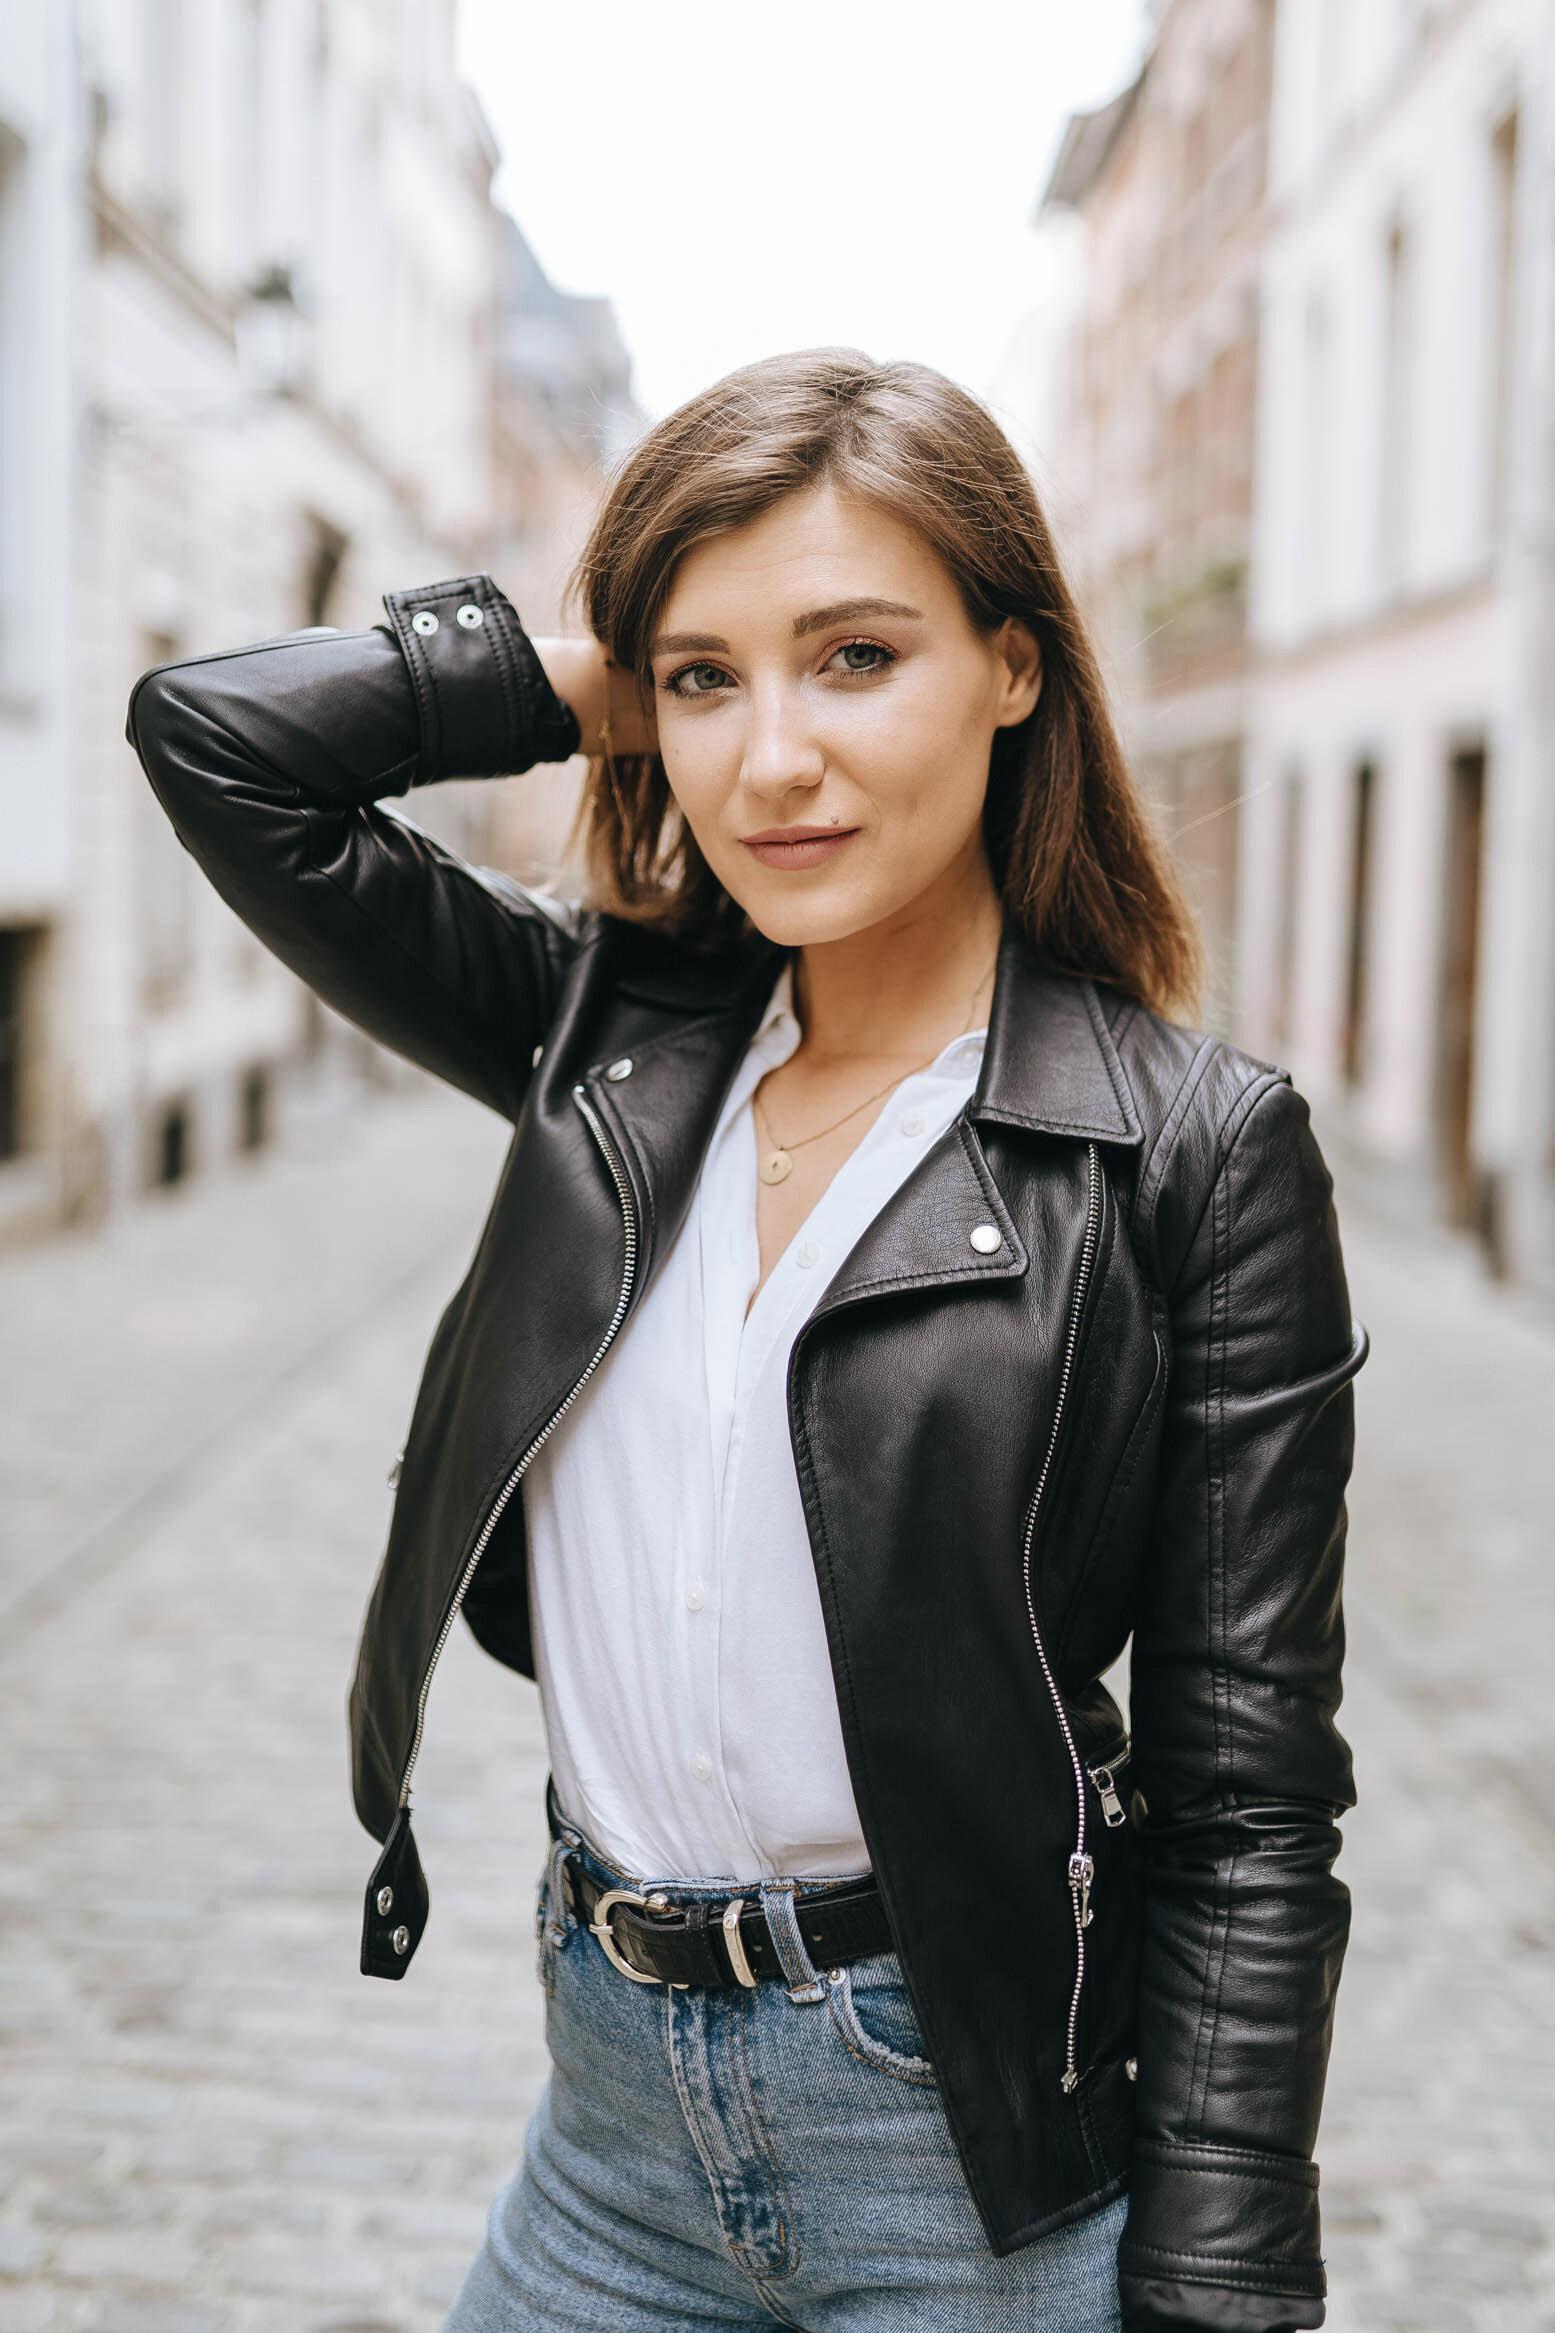 photographe-bruxelles-portrait-femme-nicolasleleu-8.jpg